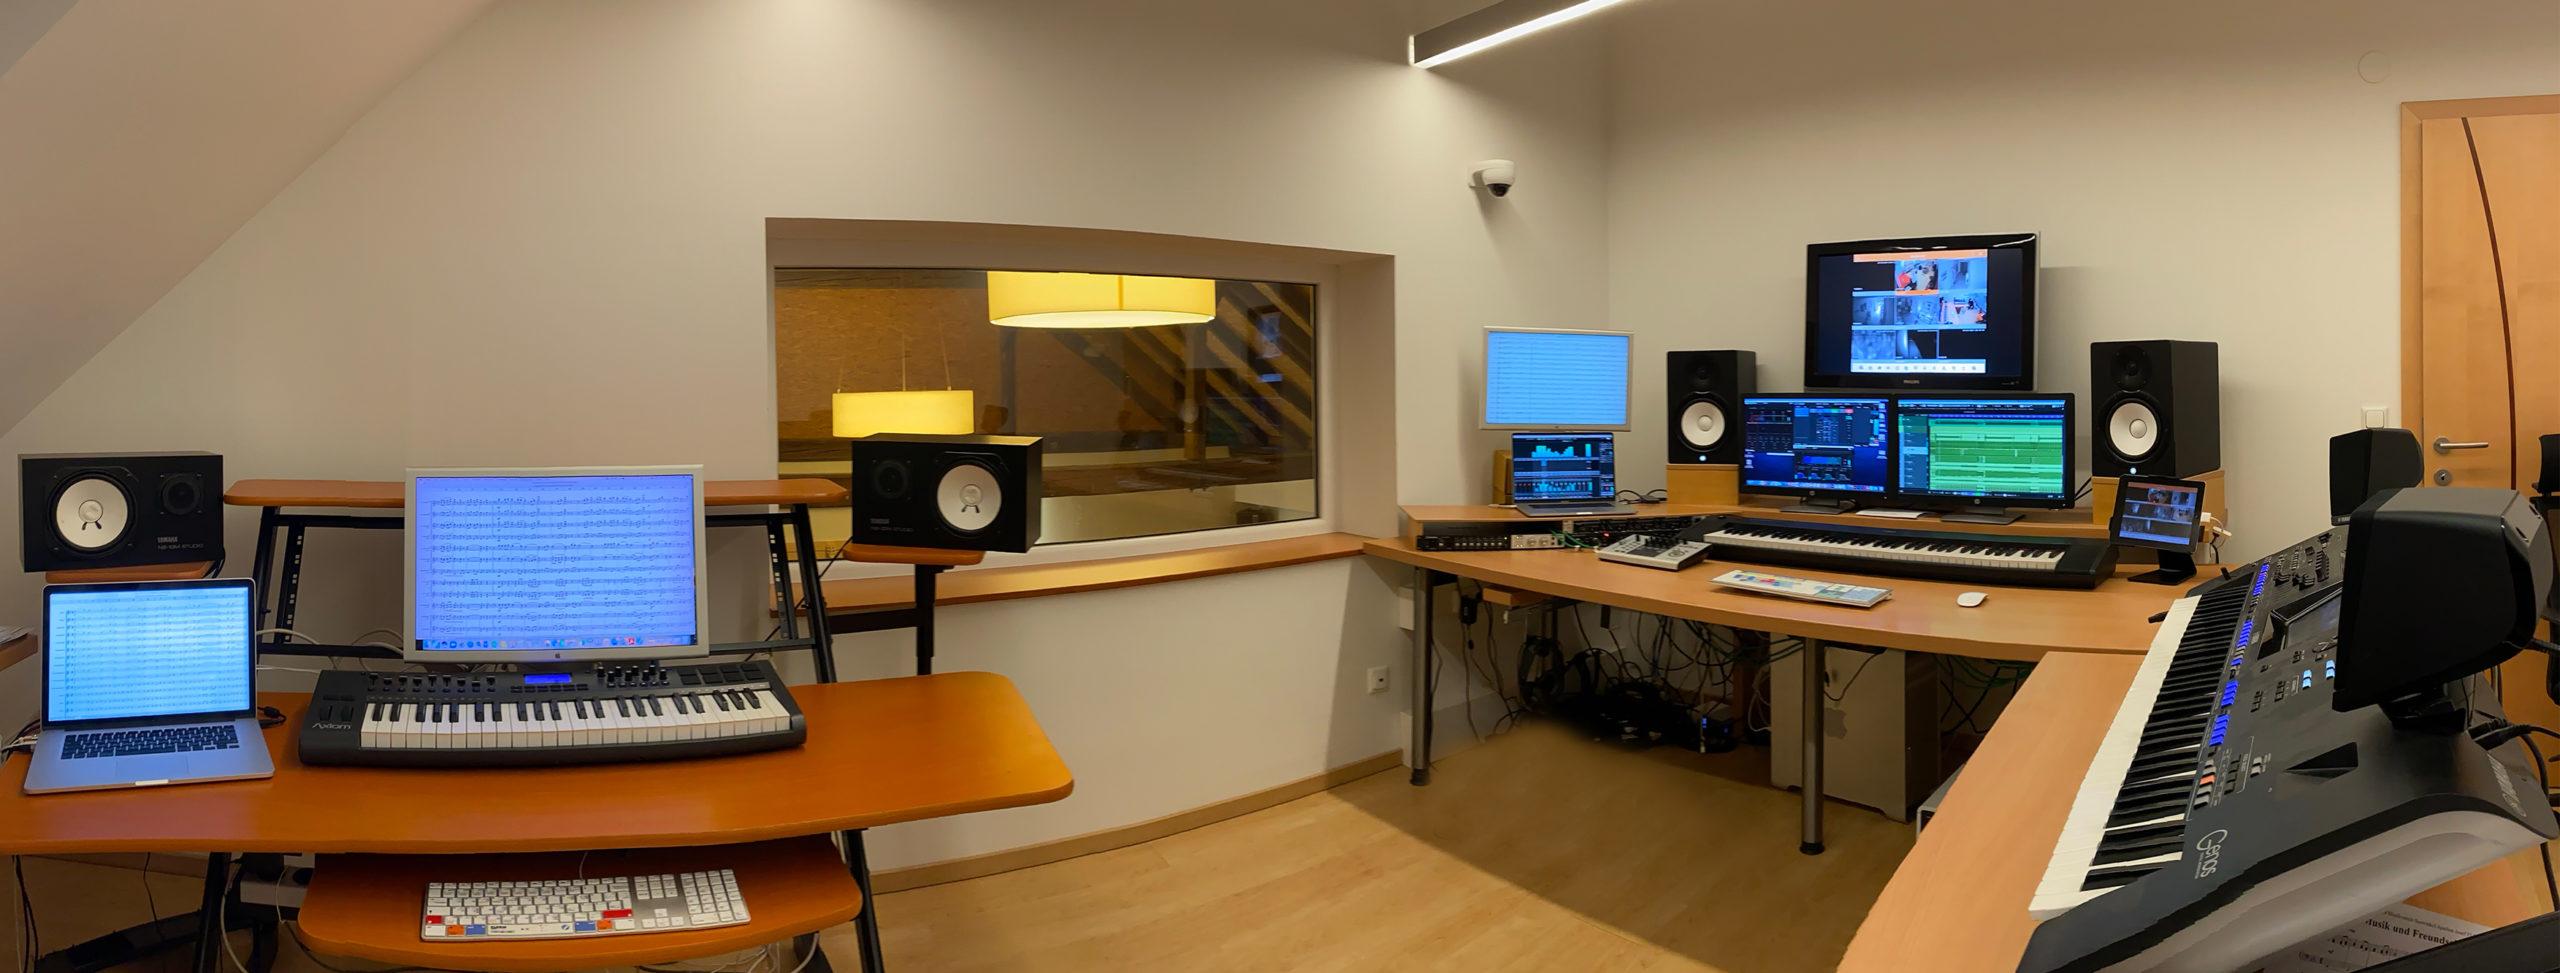 Computer und Audio Interfaces im Tonstudio Burgenland SMT-Records